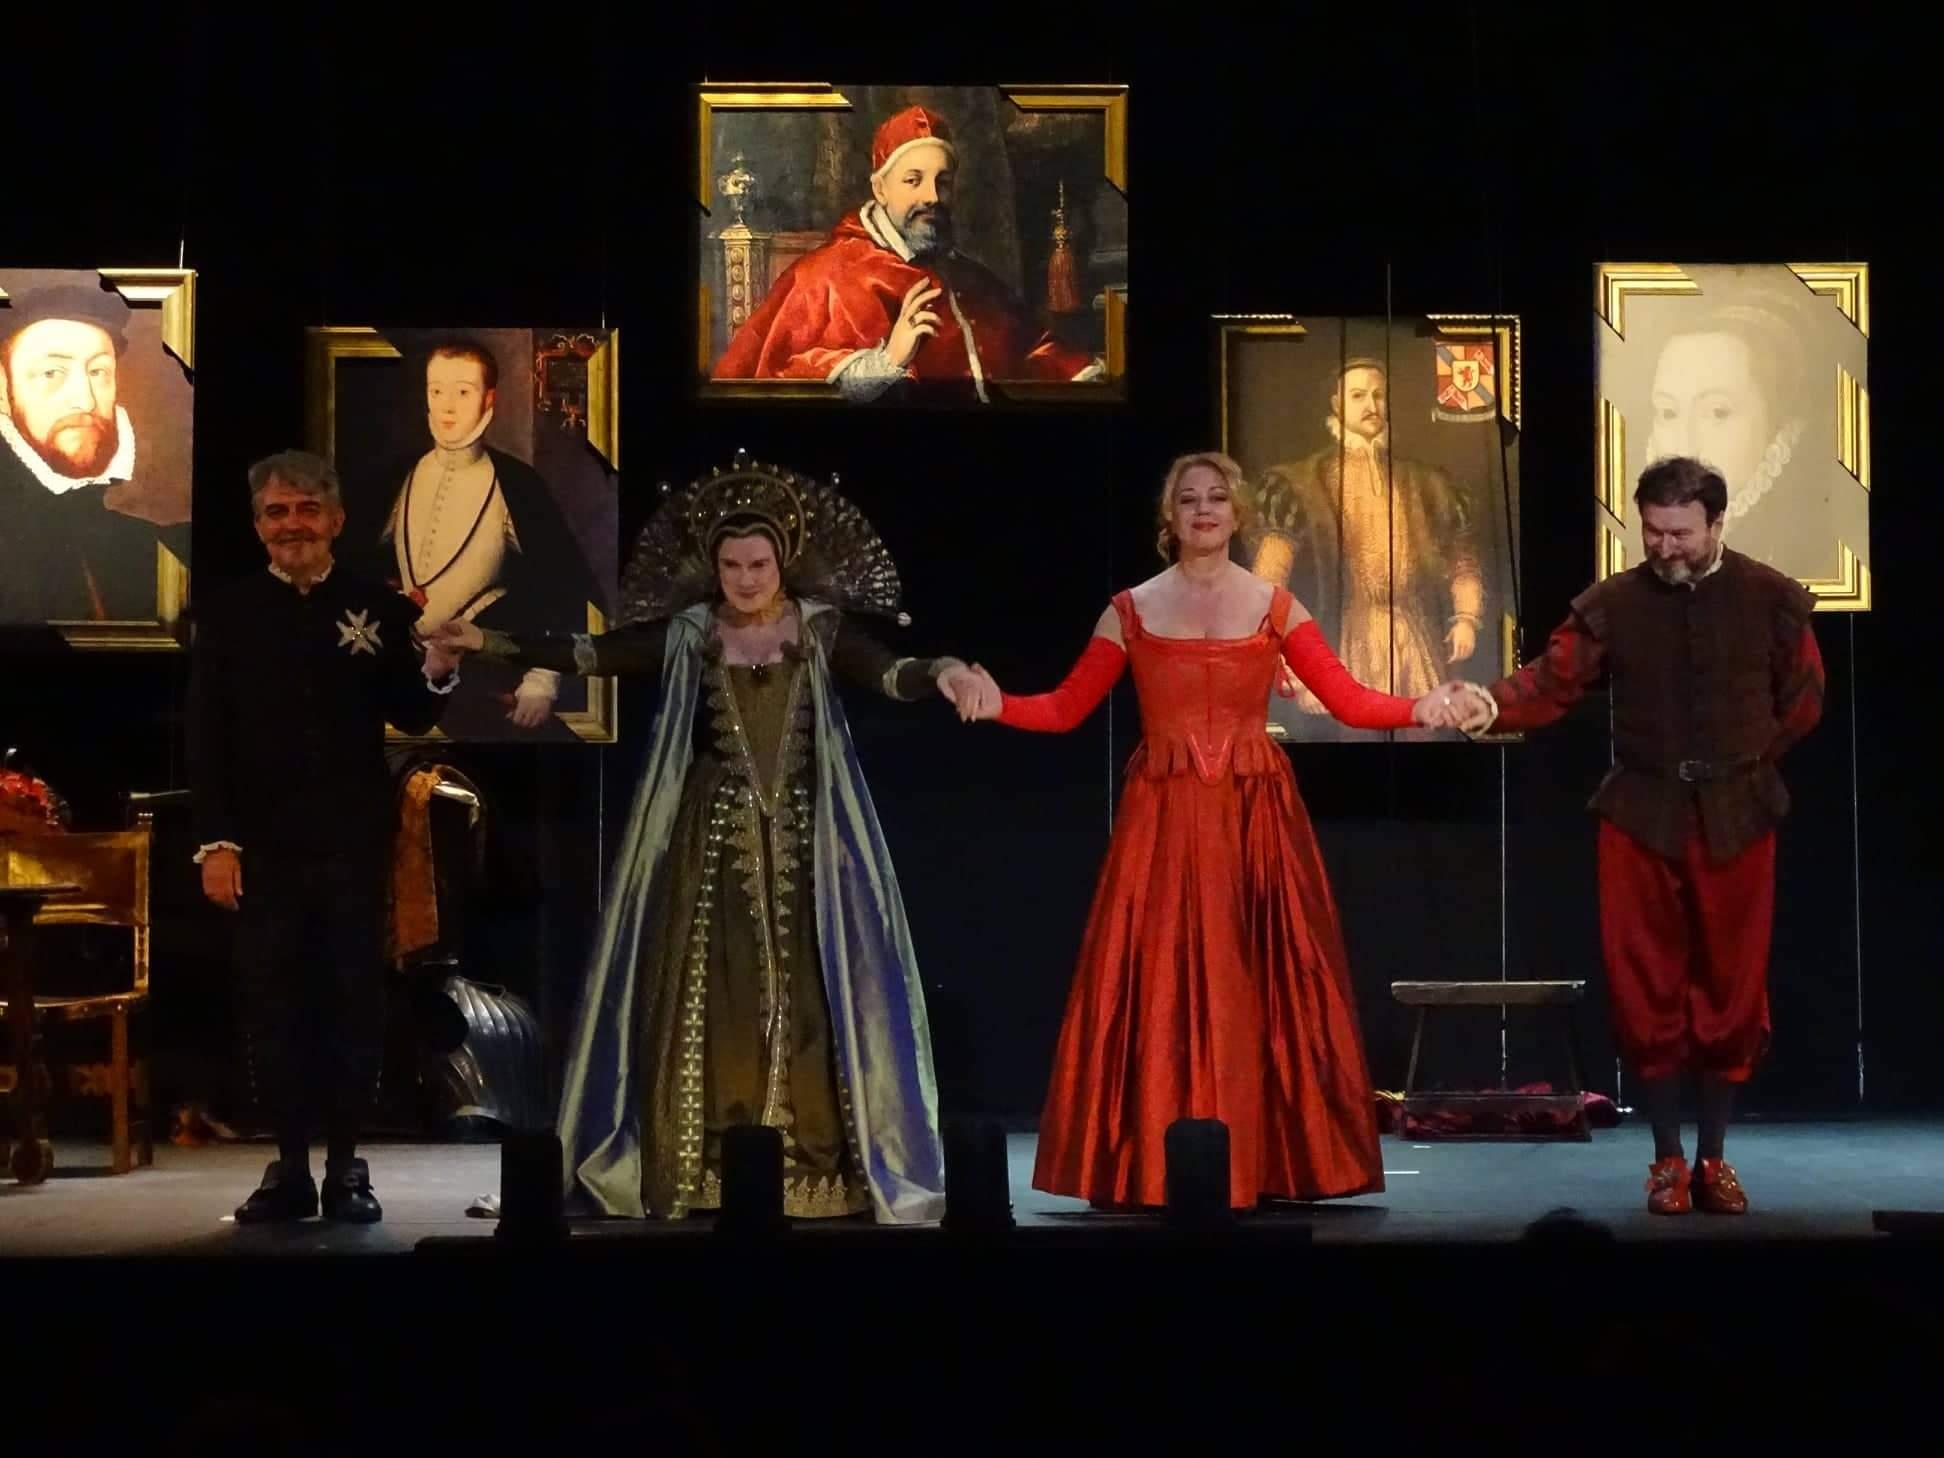 Merecido homenaje a Manuel Canseco, en el 9º Festival de Teatro y Títeres de Torralba de Calatrava 13